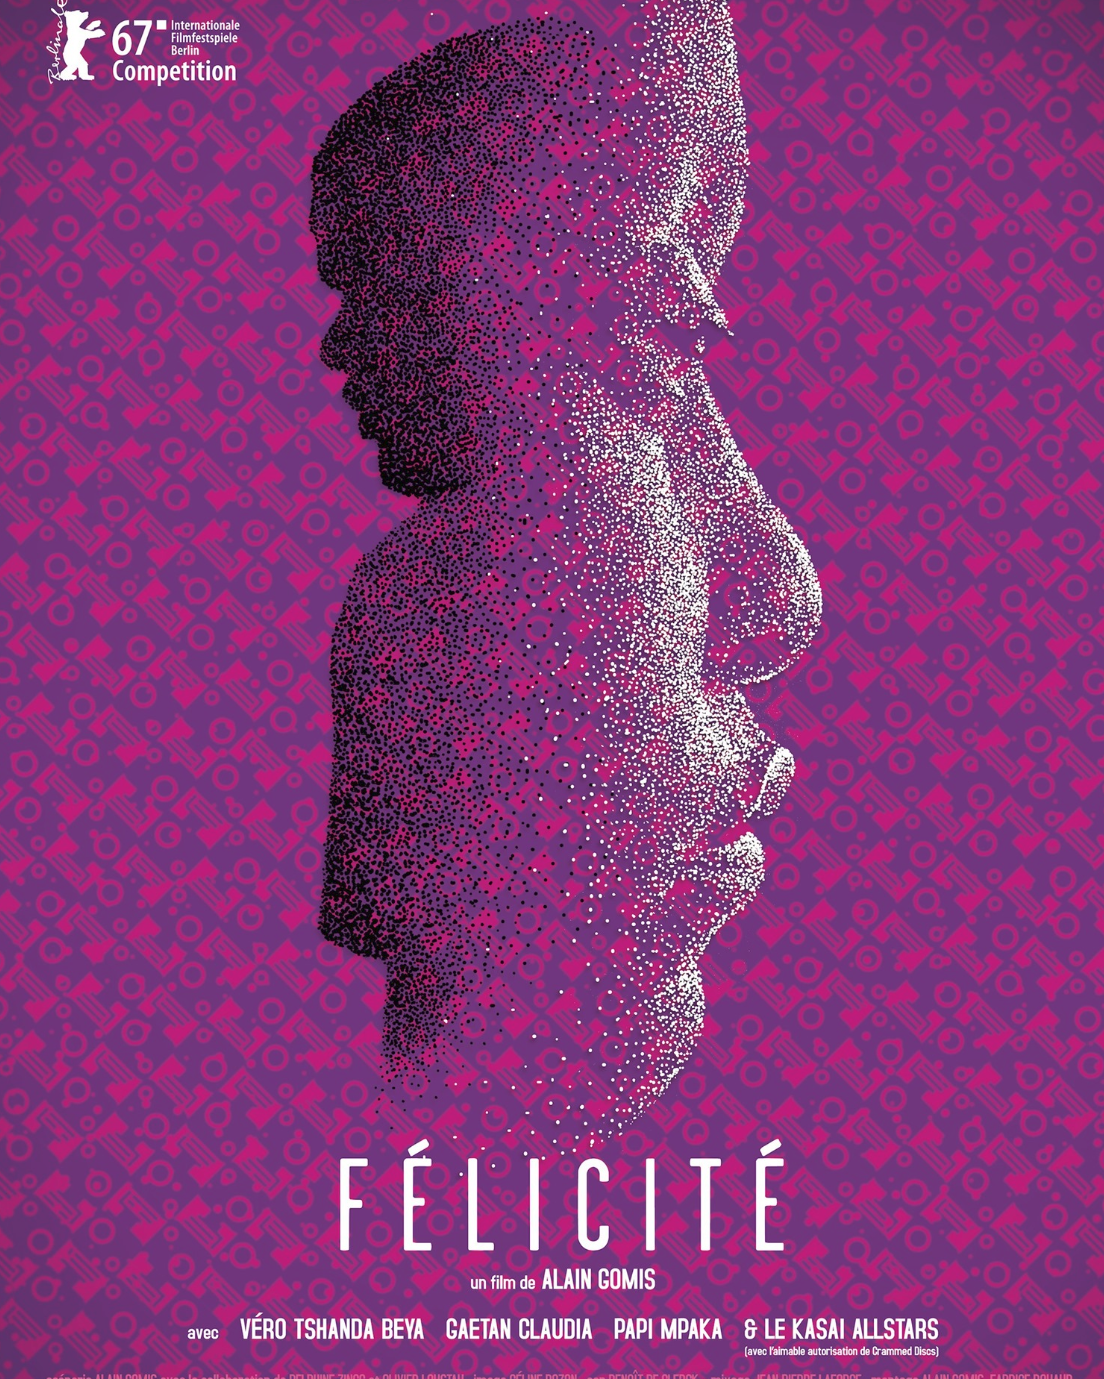 Felicite-Macaal-Morocco-Travel-Blog